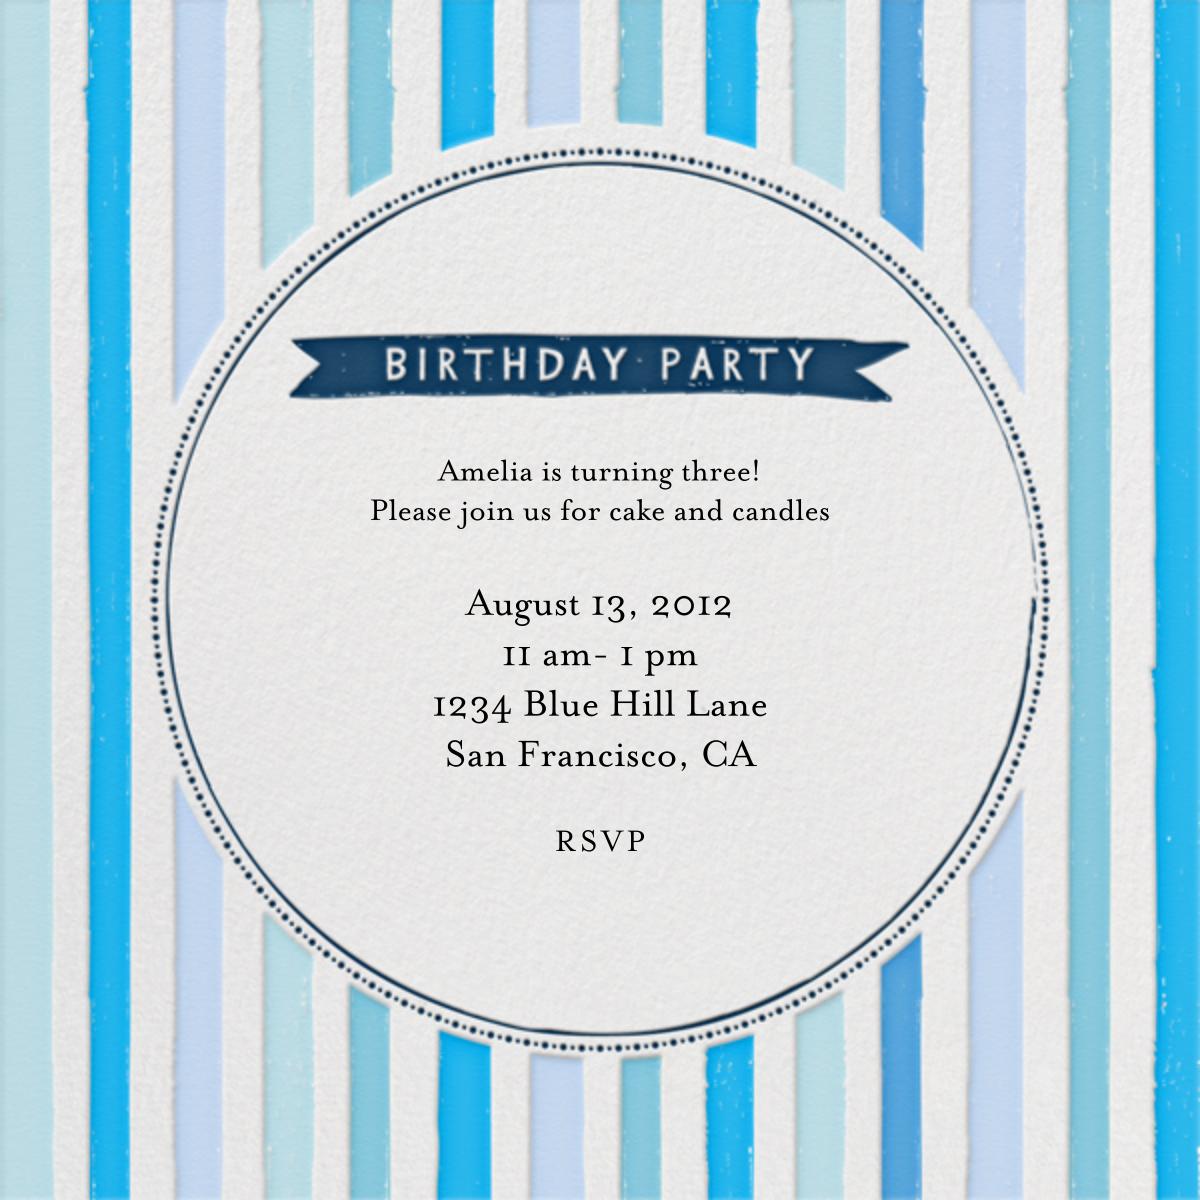 Chocolate or Vanilla Ice Cream - Blues - Mr. Boddington's Studio - Kids' birthday